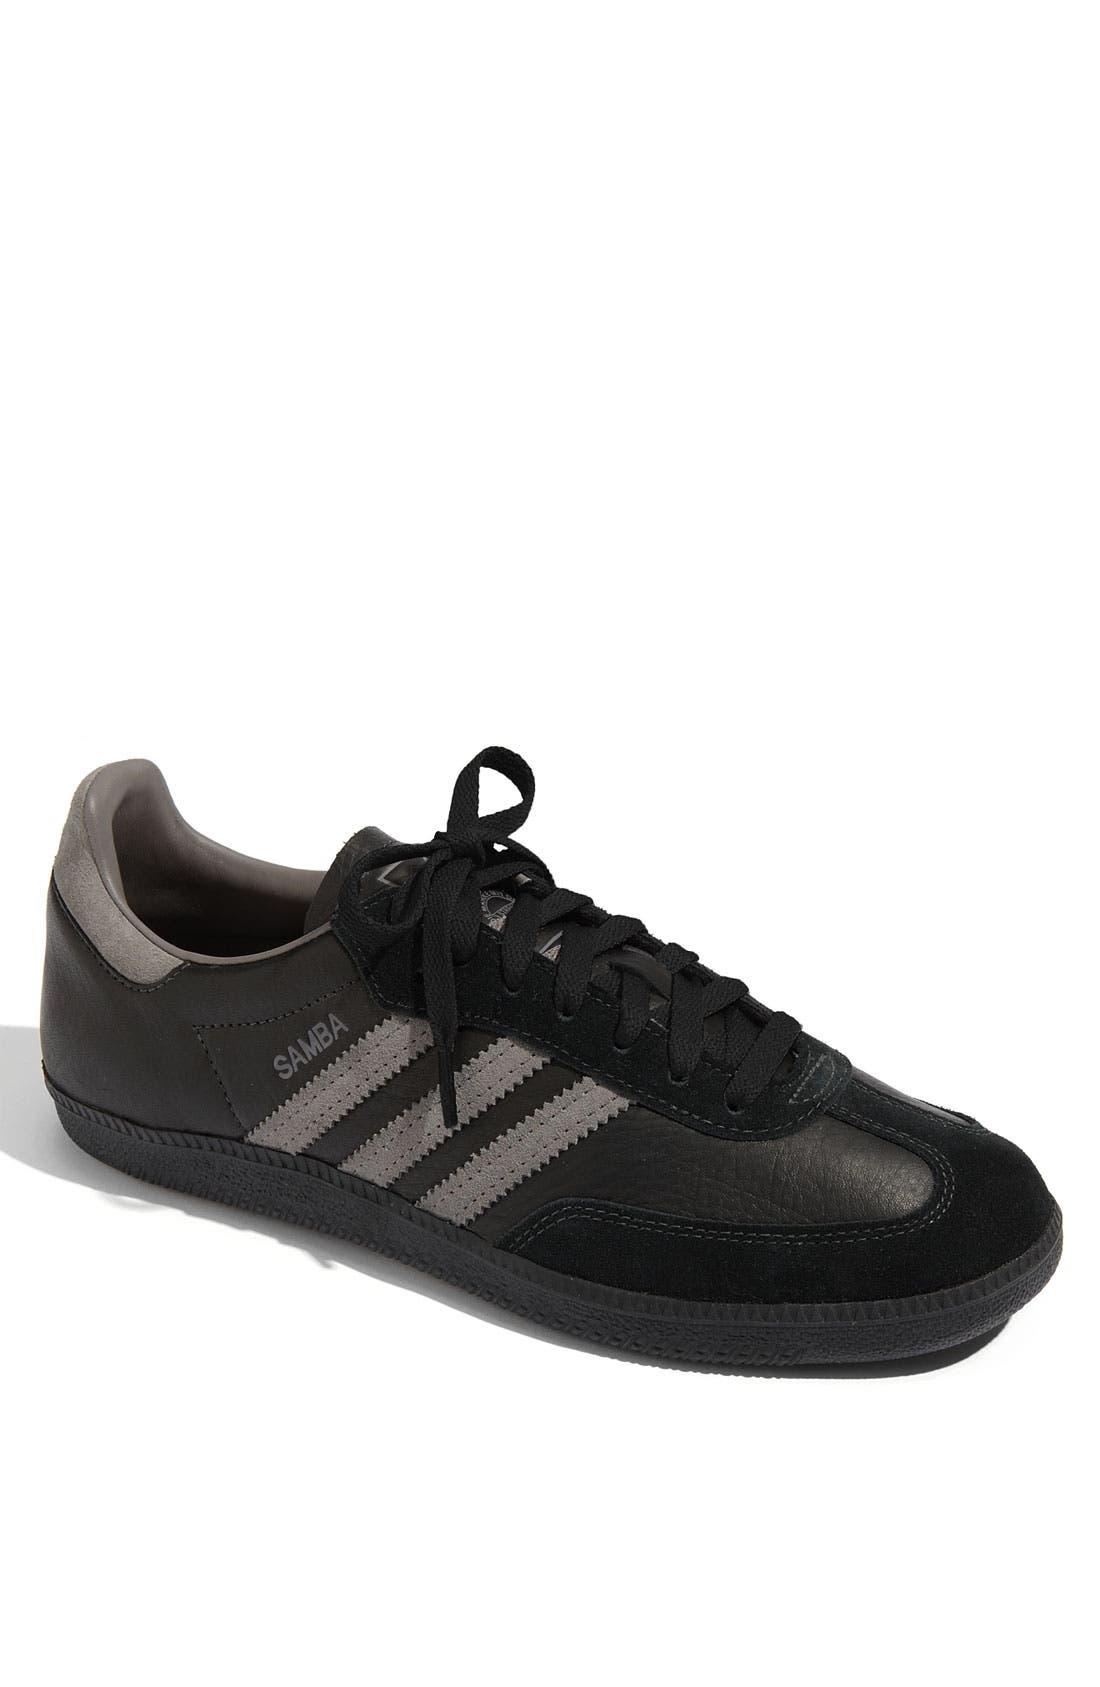 Main Image - adidas 'Samba' Sneaker